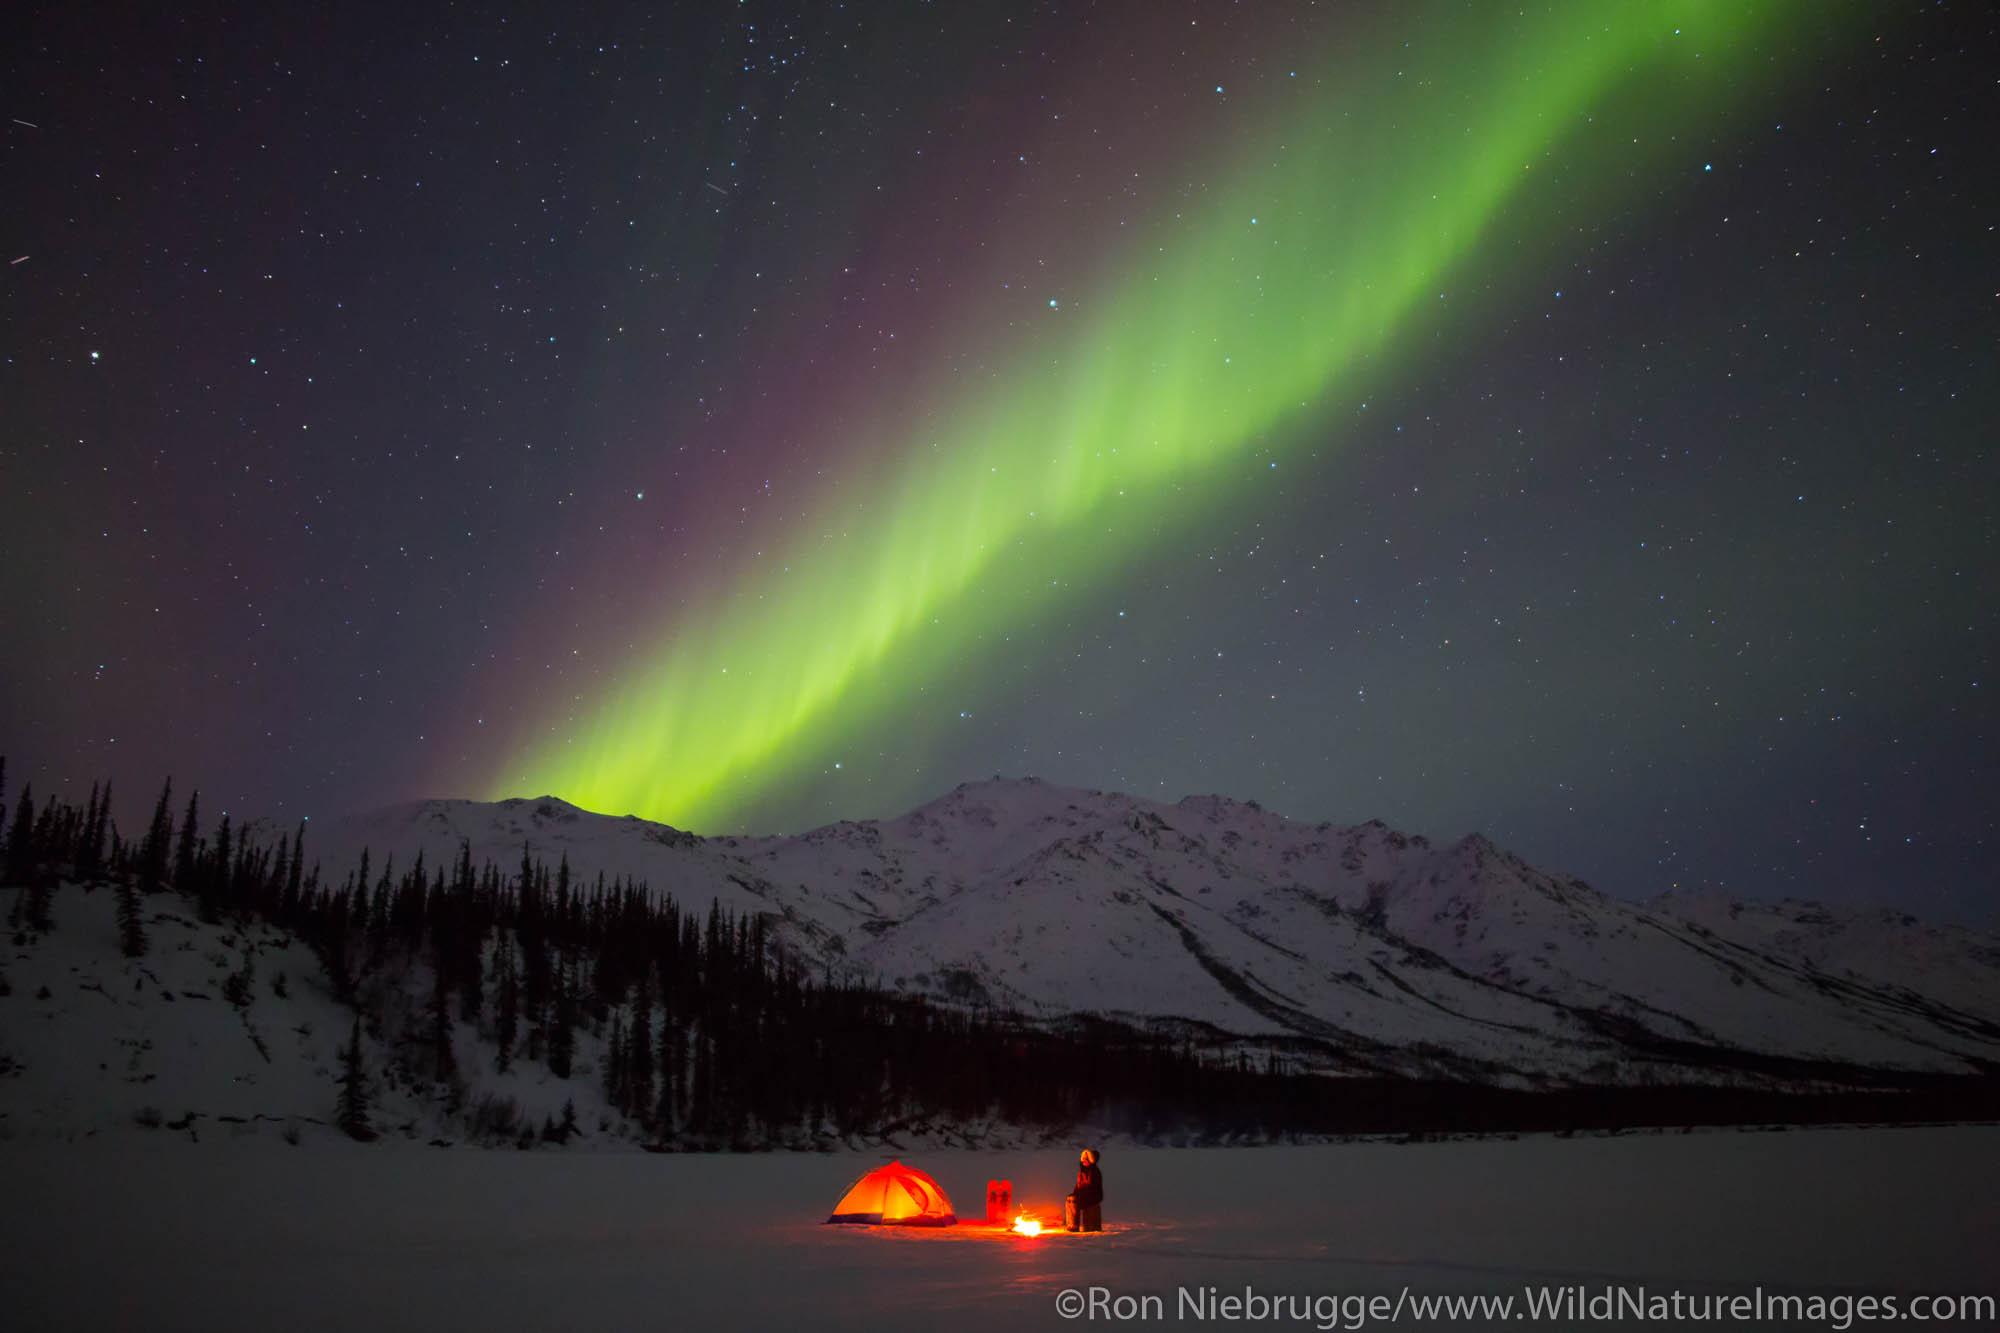 Camping under the Aurora Borealis in the Brooks Range, Alaska.